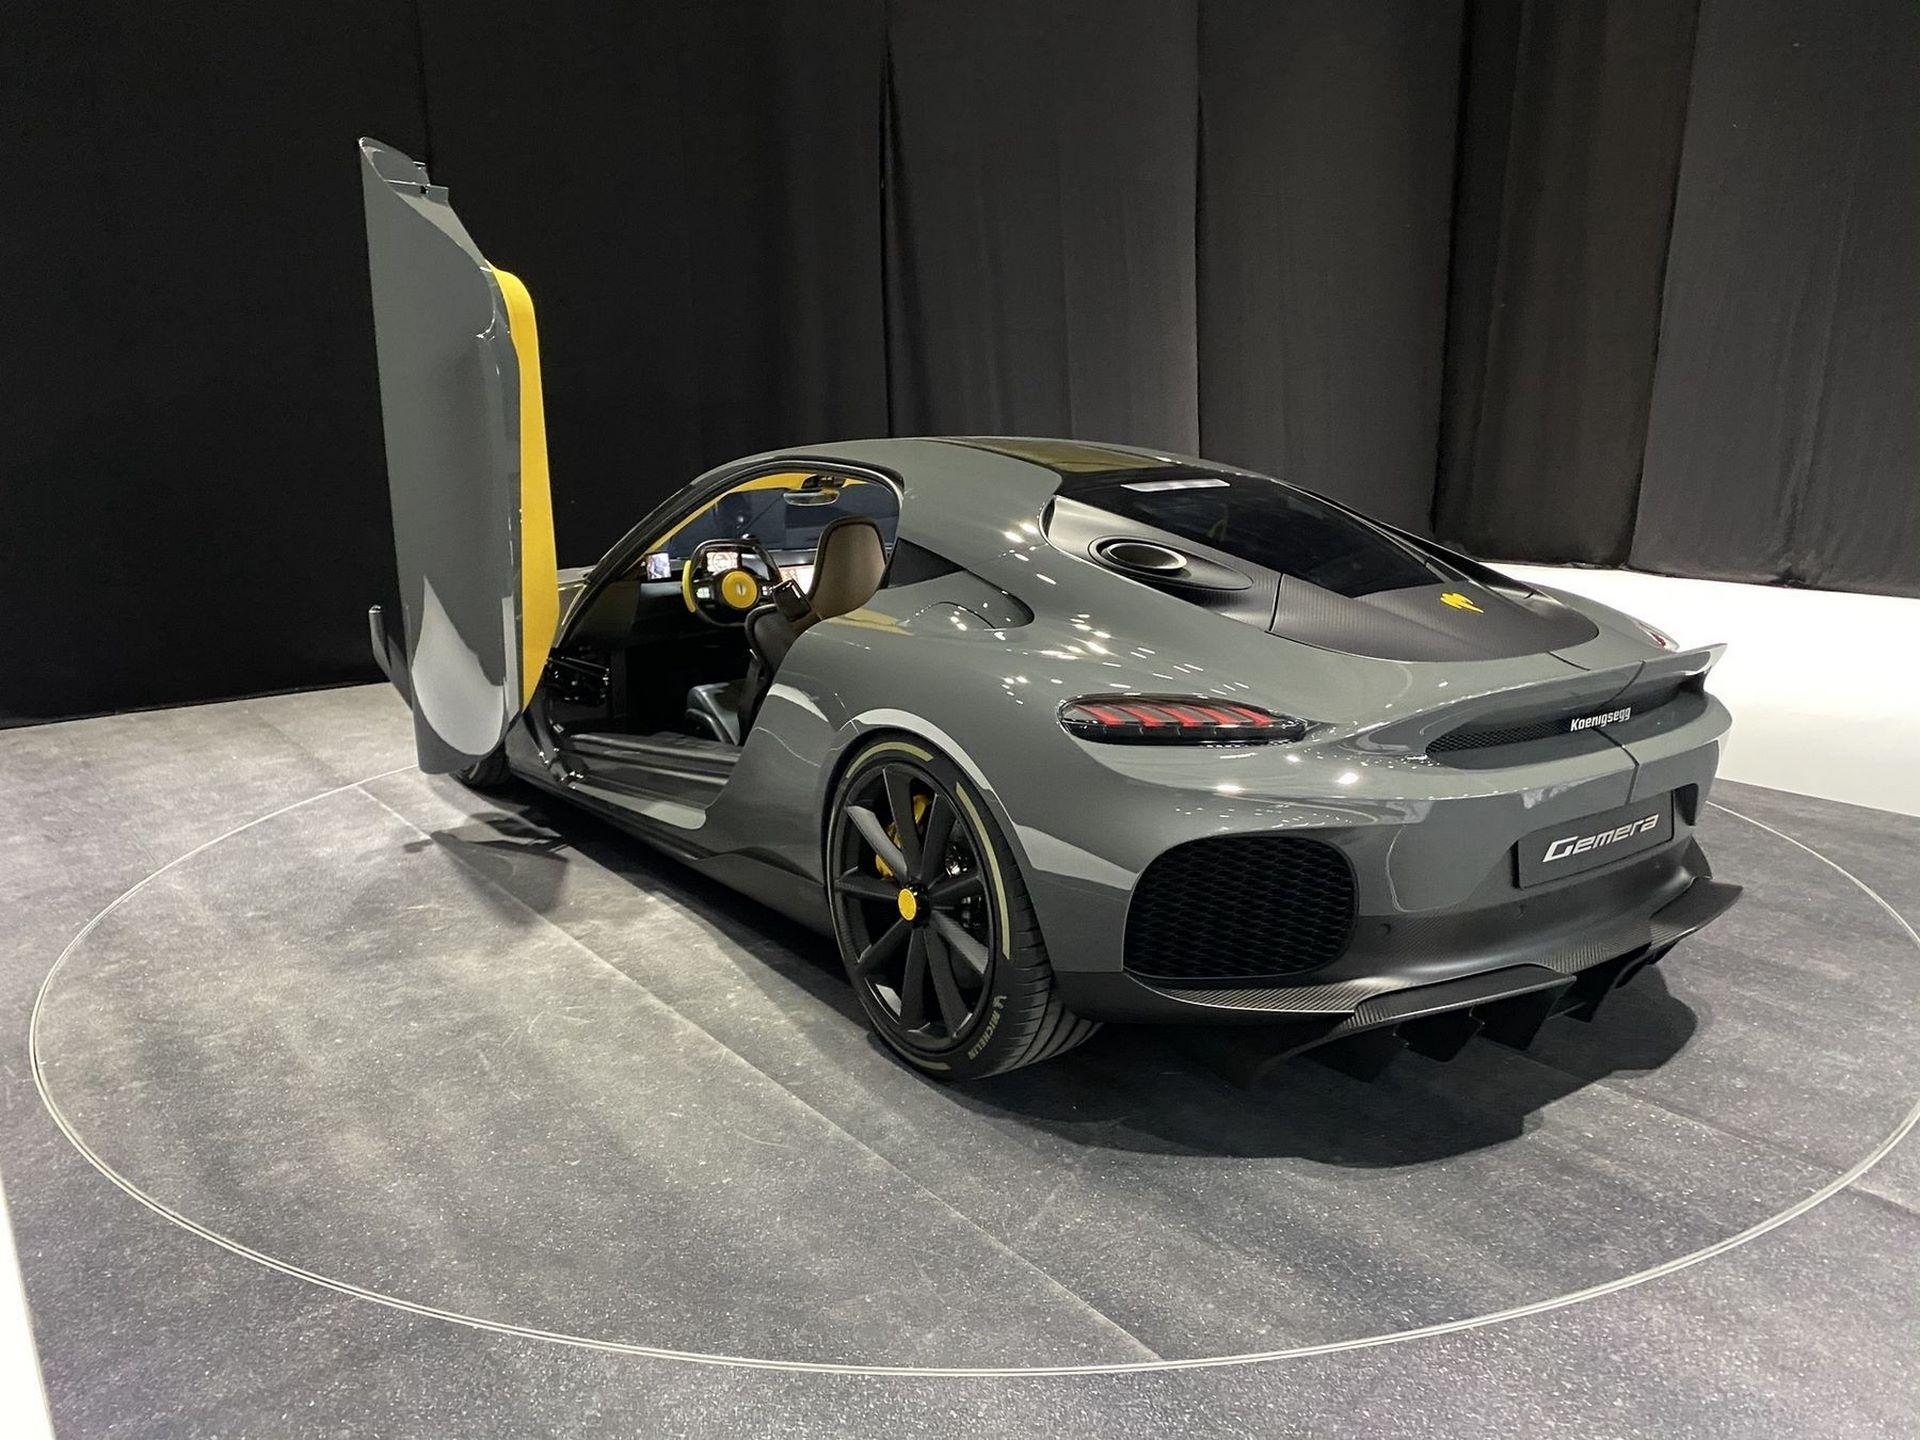 Geneva motor show 2020 (19)